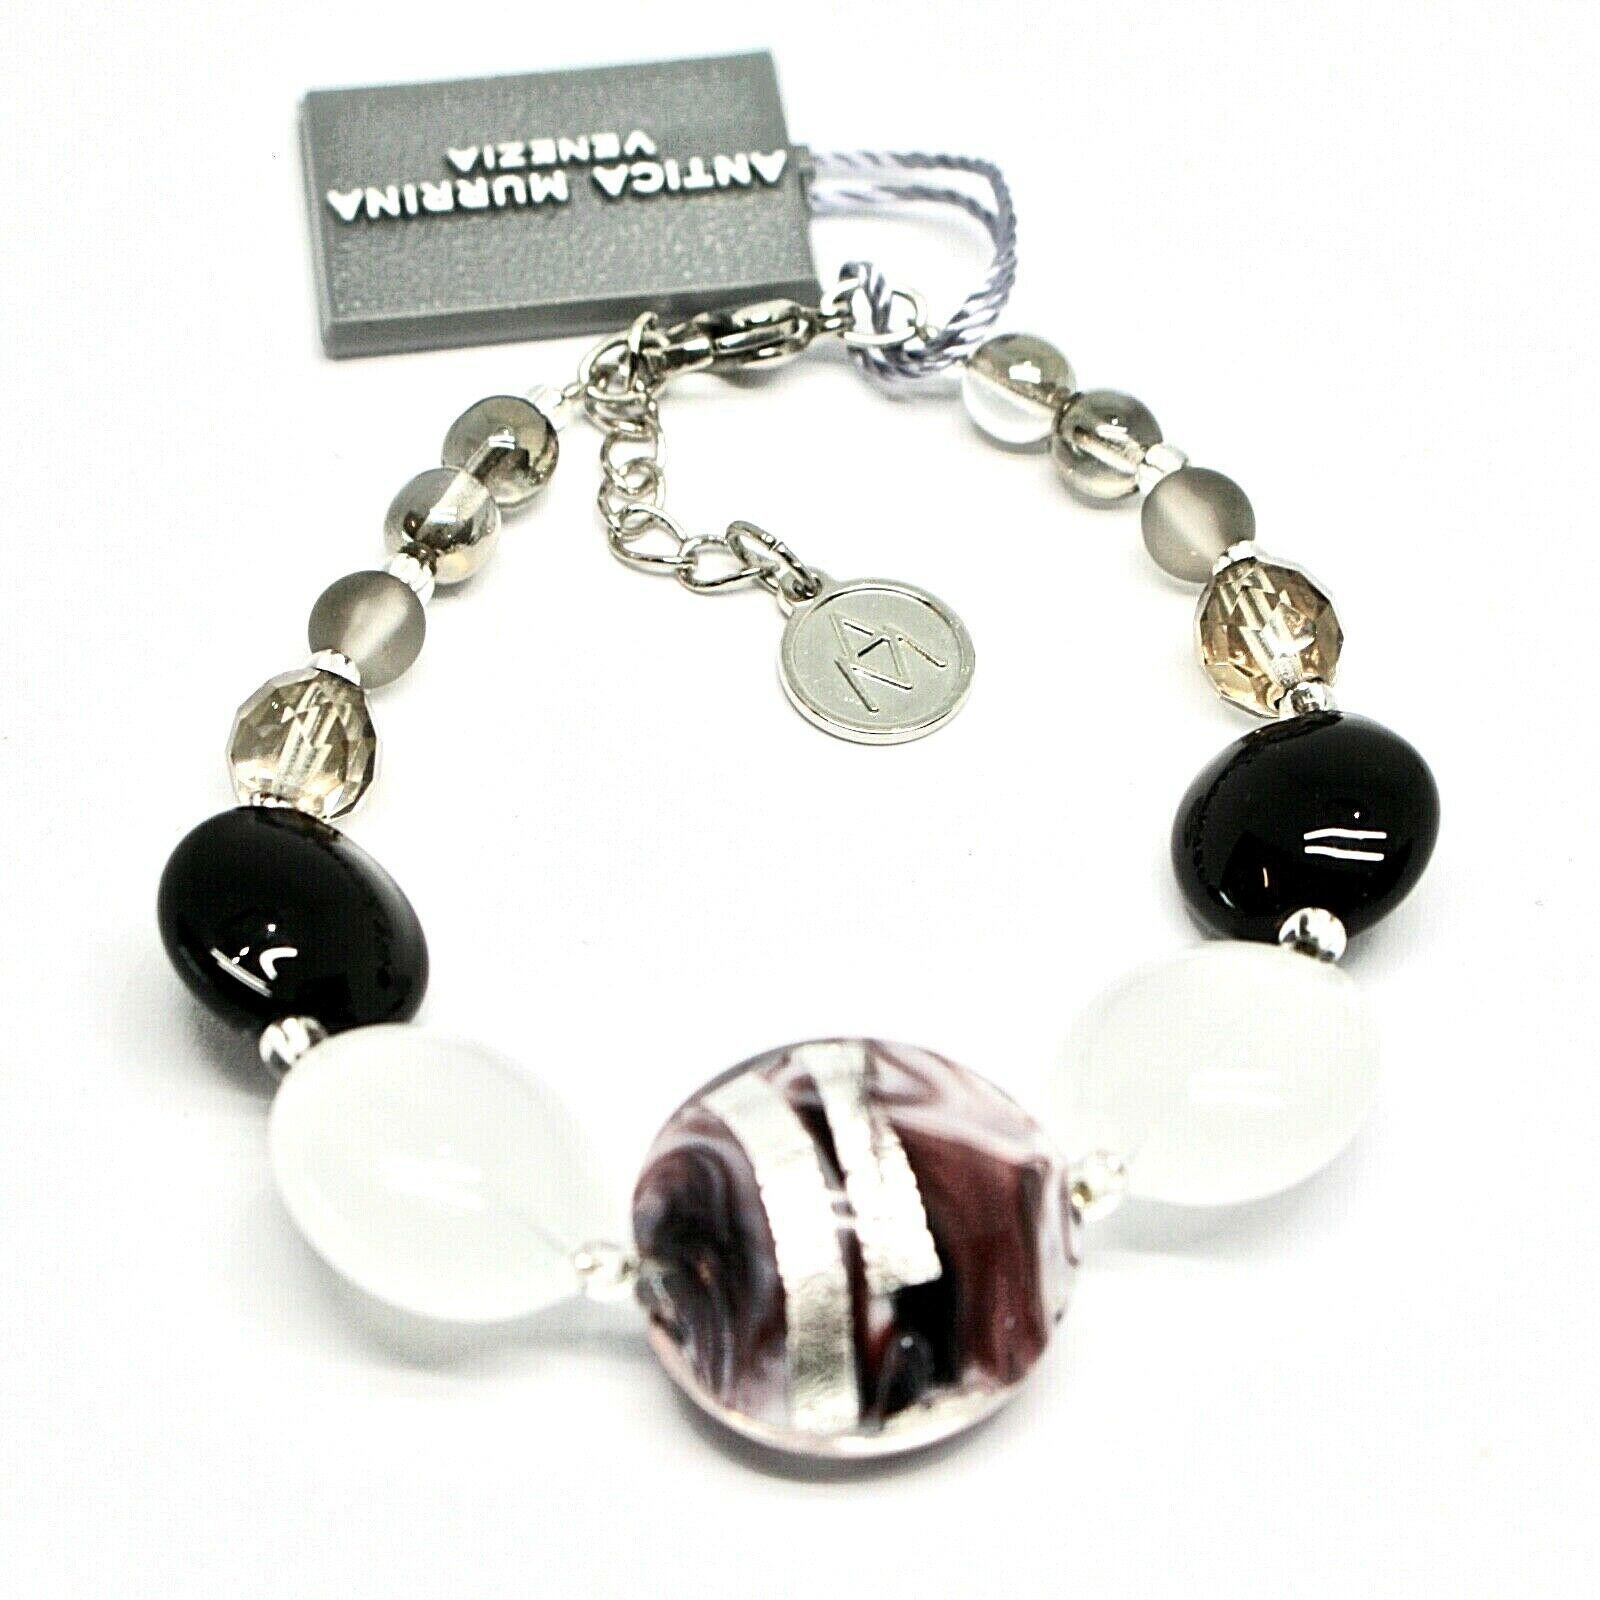 Bracelet Antica Murrina Venezia with Murano Glass White and Black BR827A15